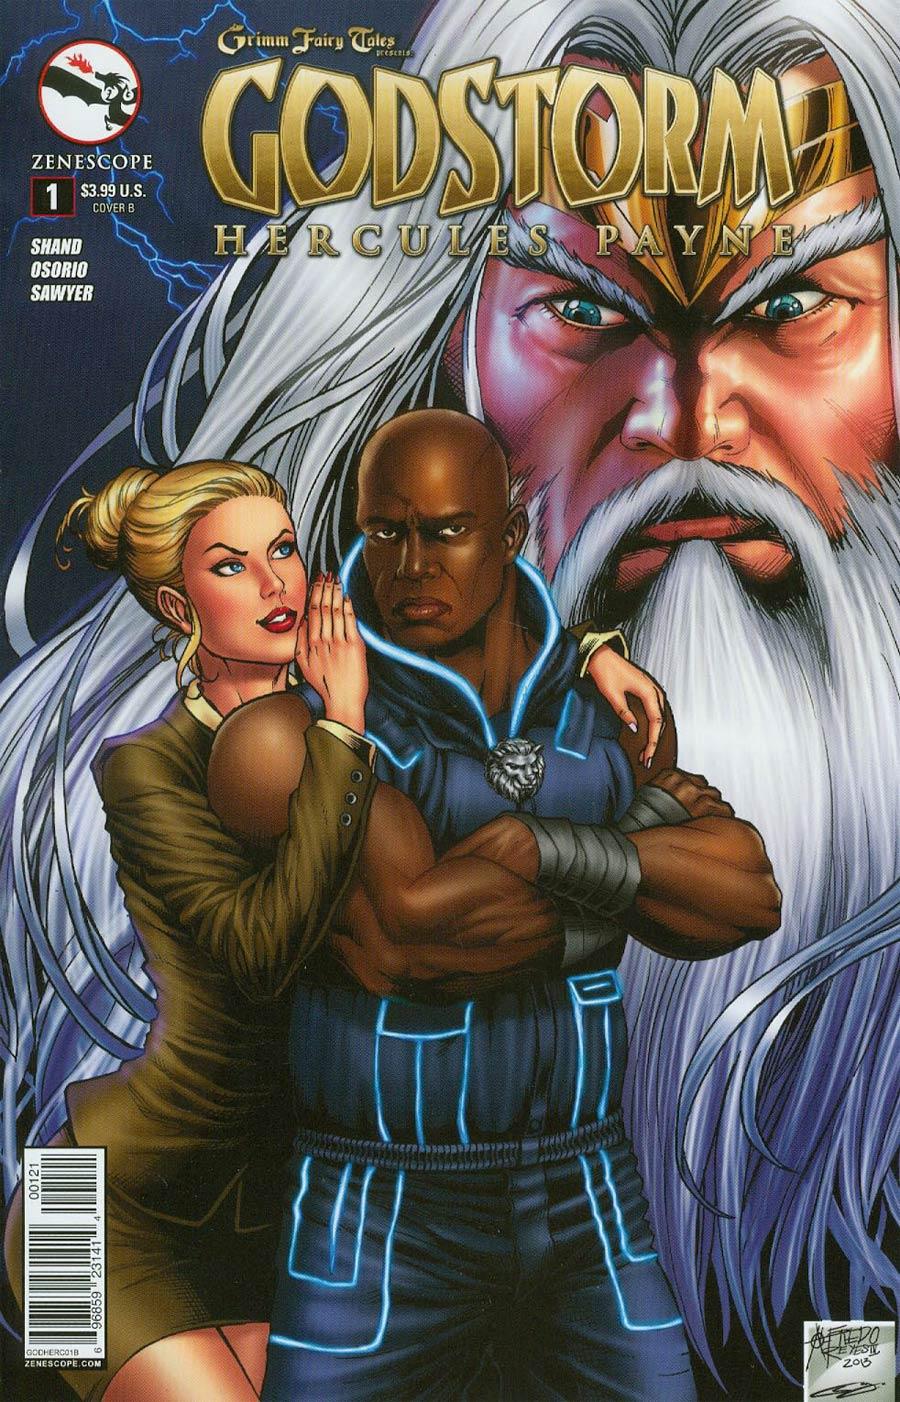 Grimm Fairy Tales Presents Godstorm Hercules Payne #1 Cover B Alfredo Reyes